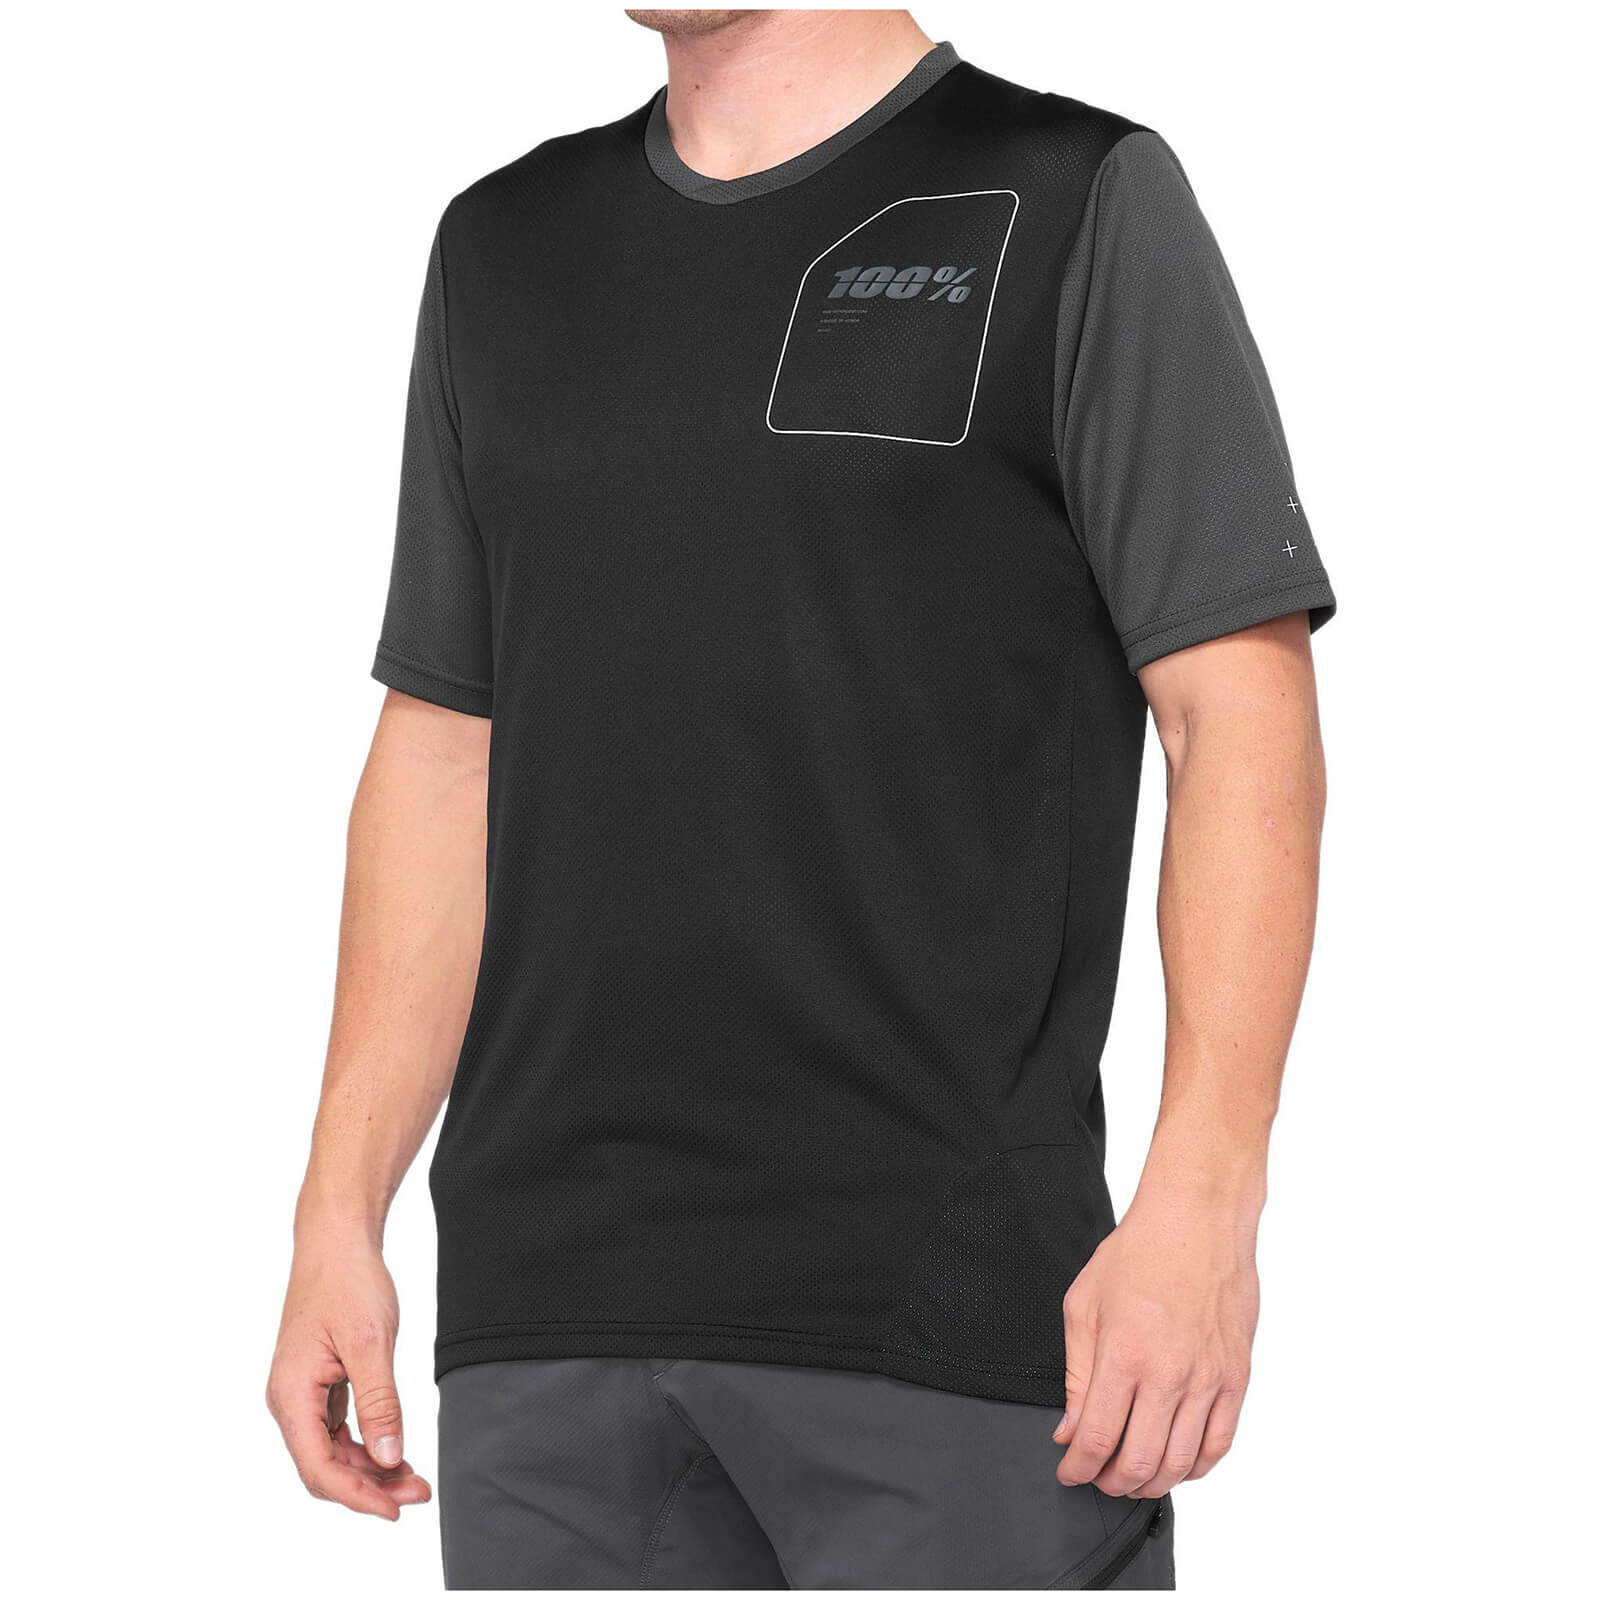 100% Ridecamp Mtb Jersey - S - Charcoal/black